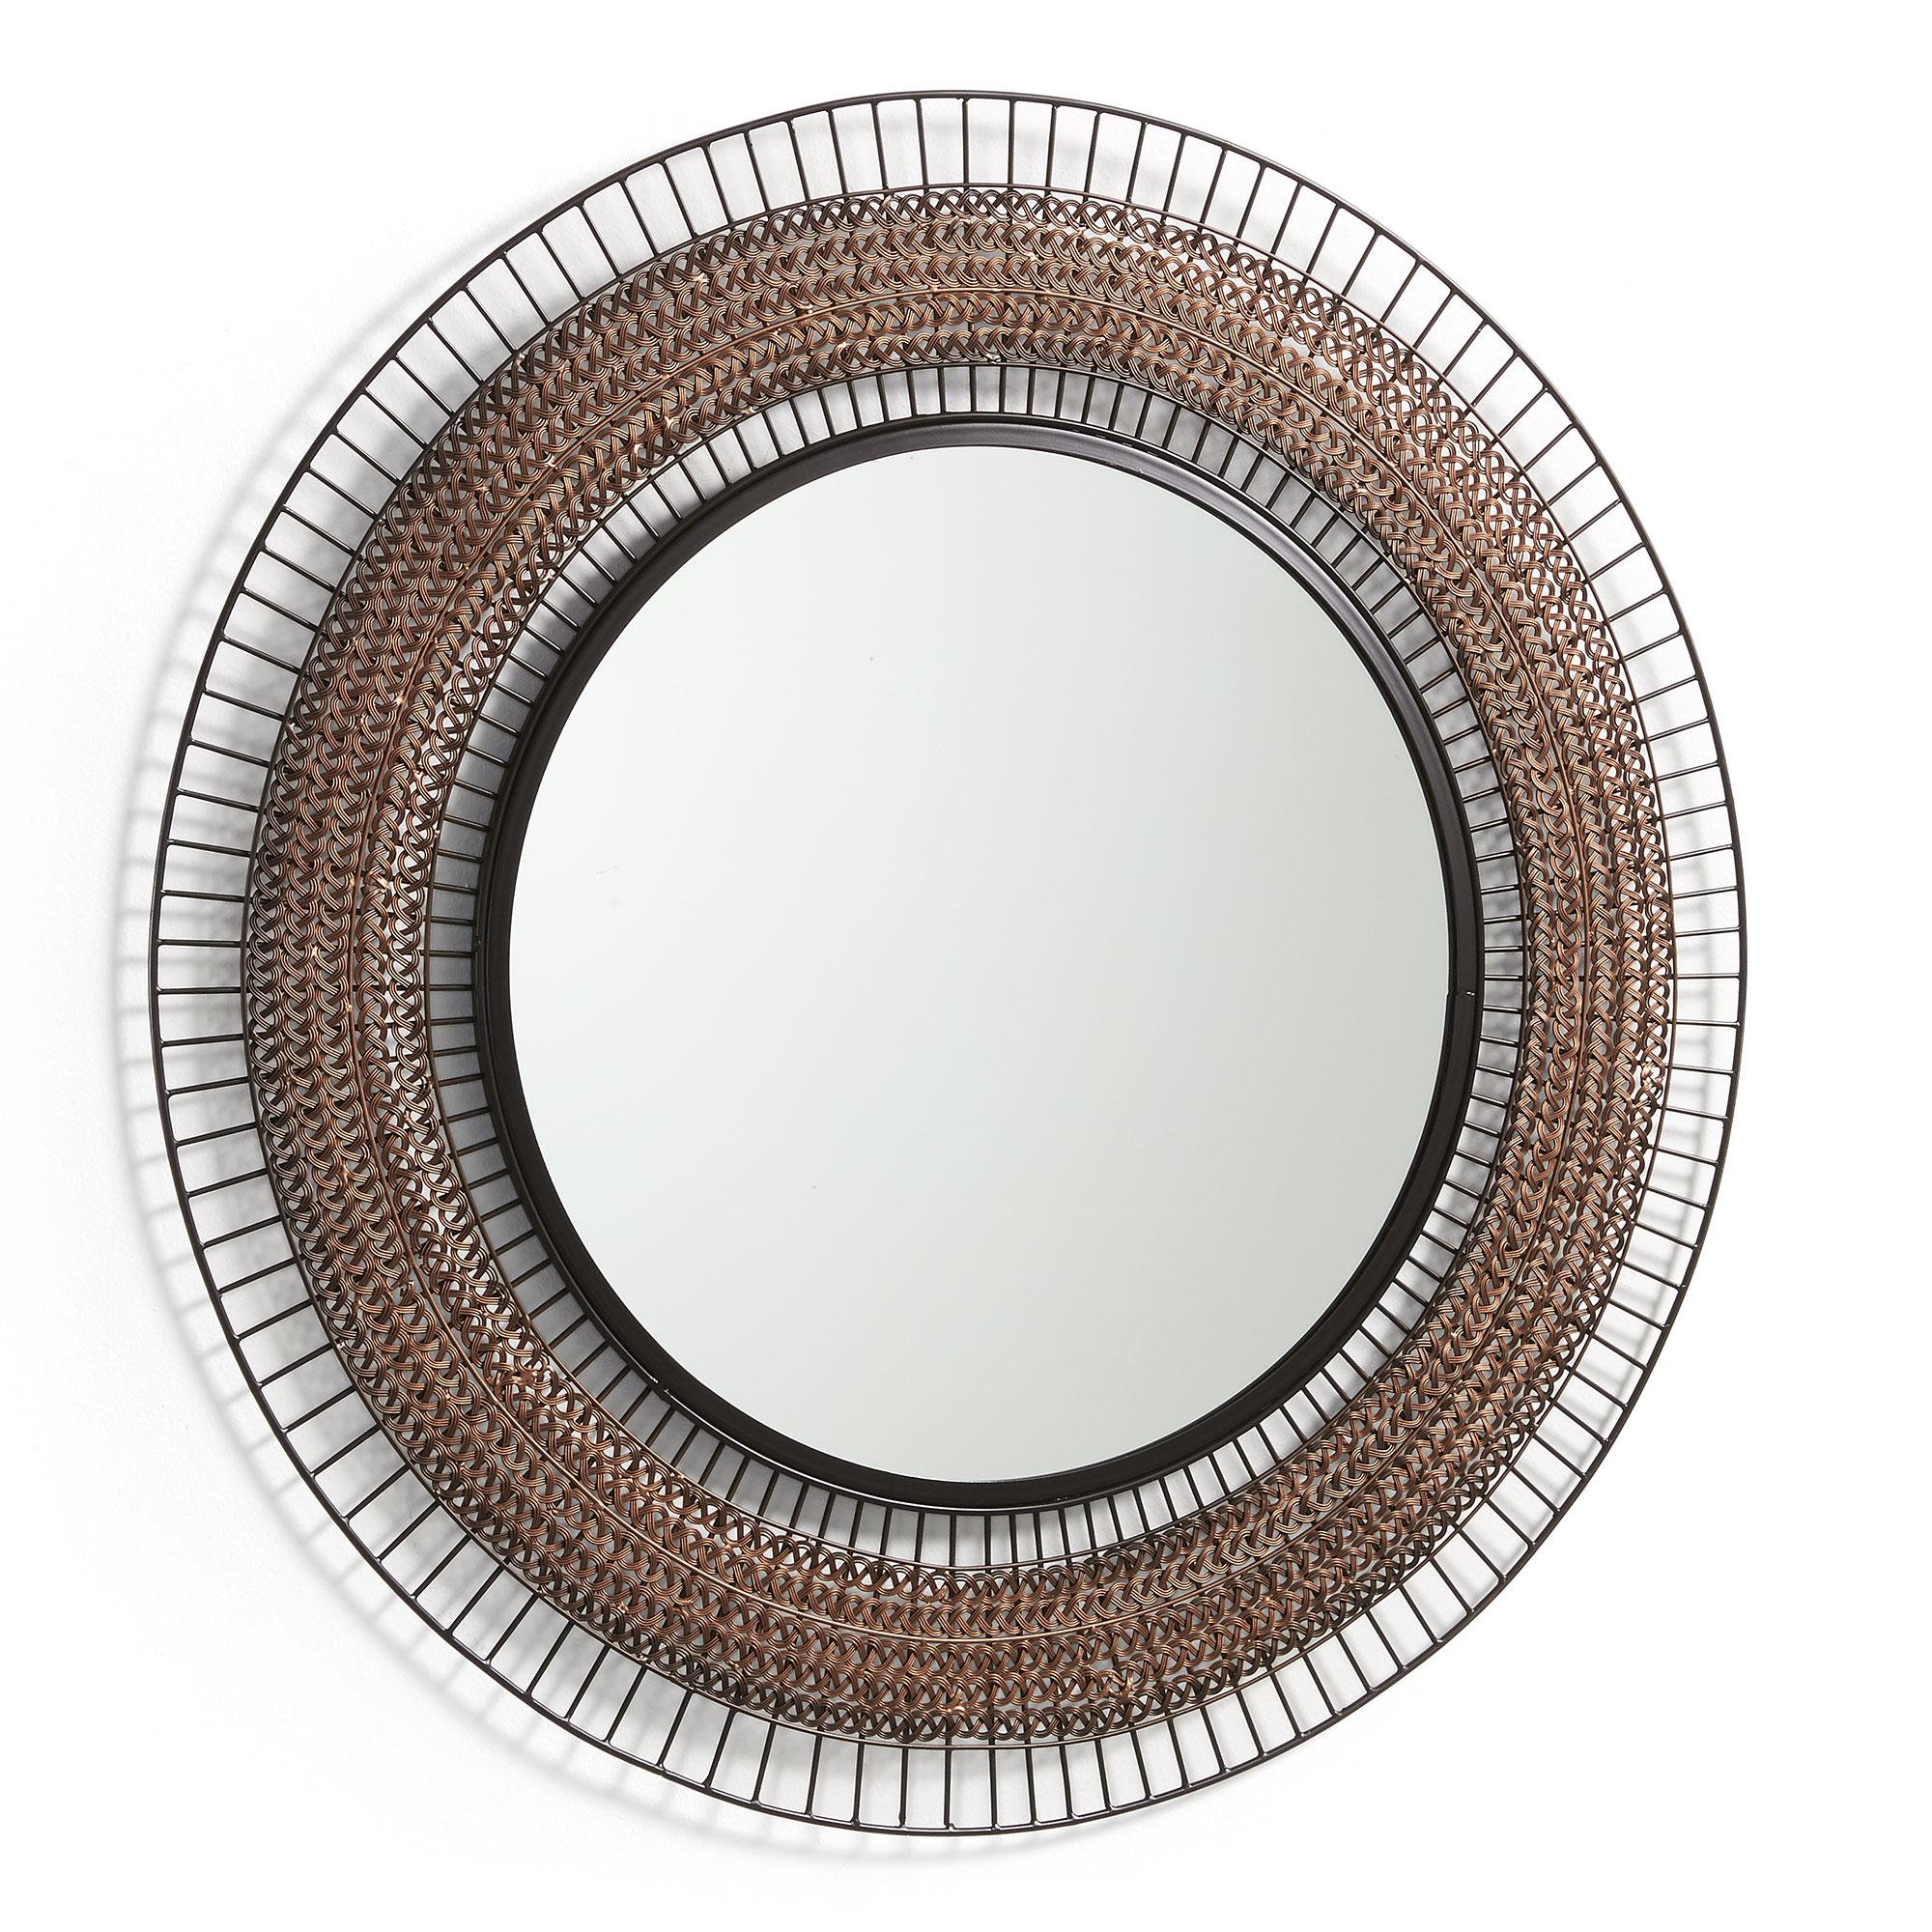 Kave home - miroir rob Ø 90 cm